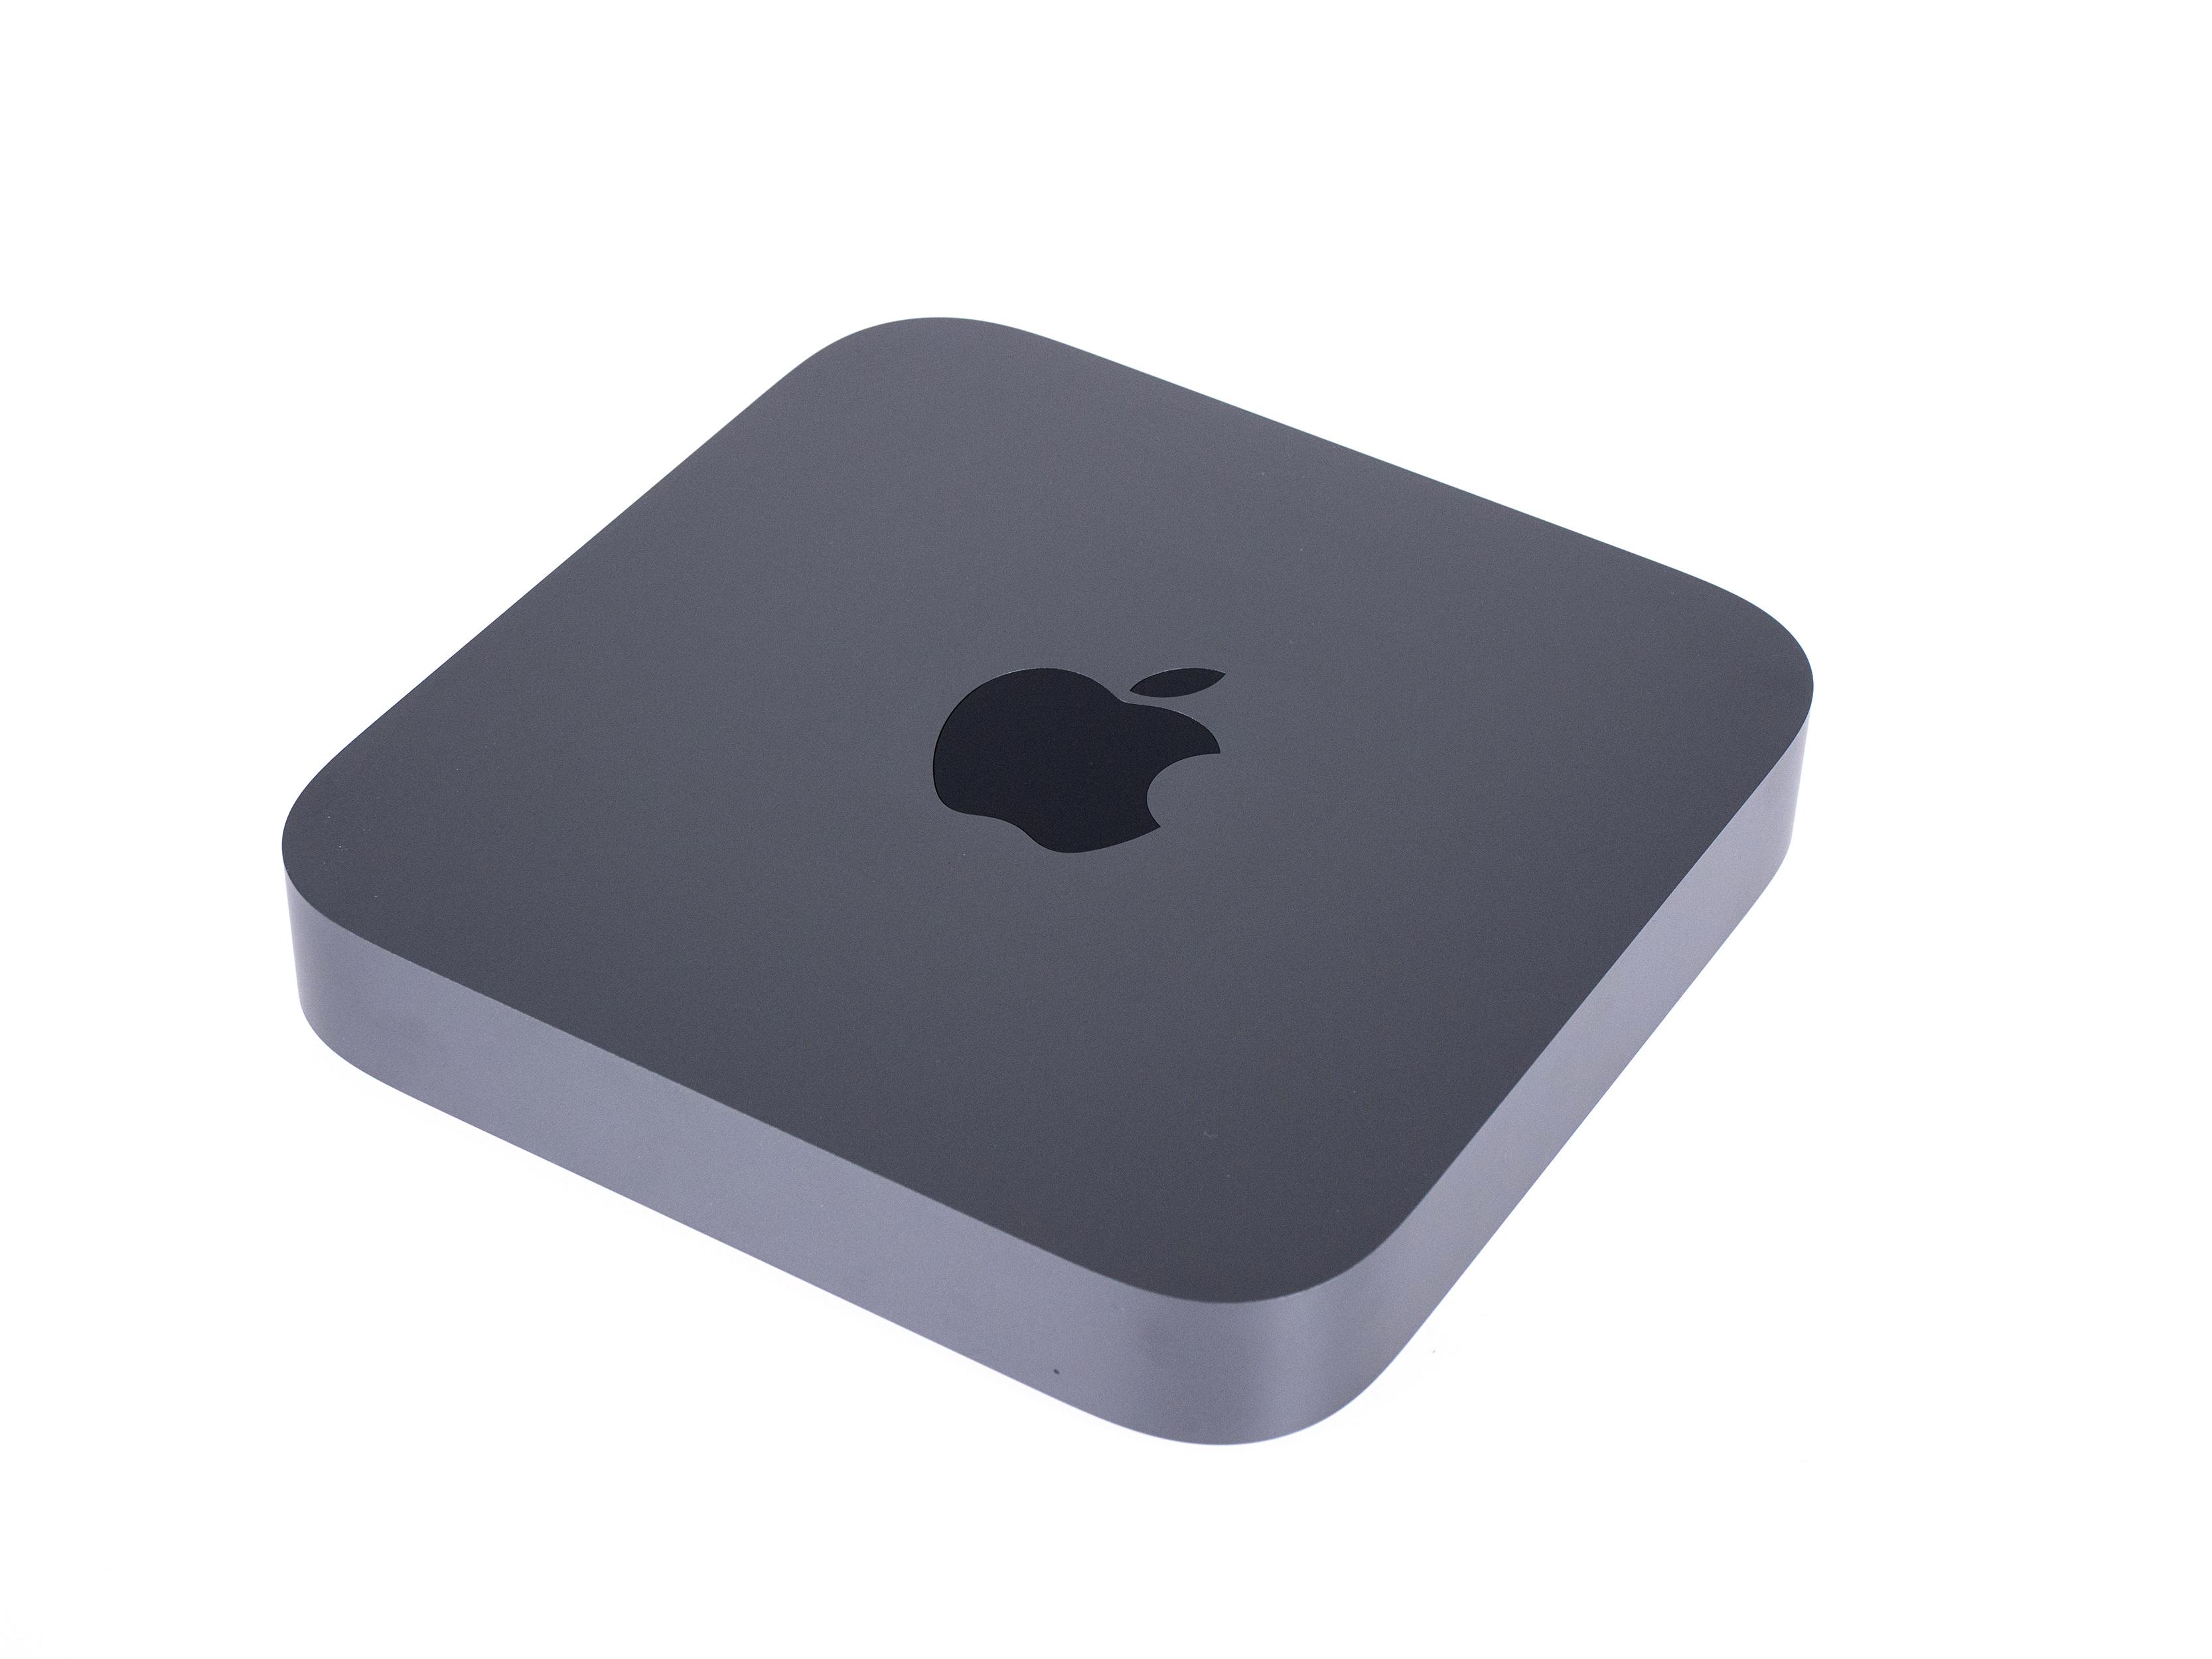 Apple Mac Mini (Late 2018) im Test: Tolles teures Teil - aber für wen? - Apples Mac Mini (Late 2018) (Bild: Martin Wolf/Golem.de)